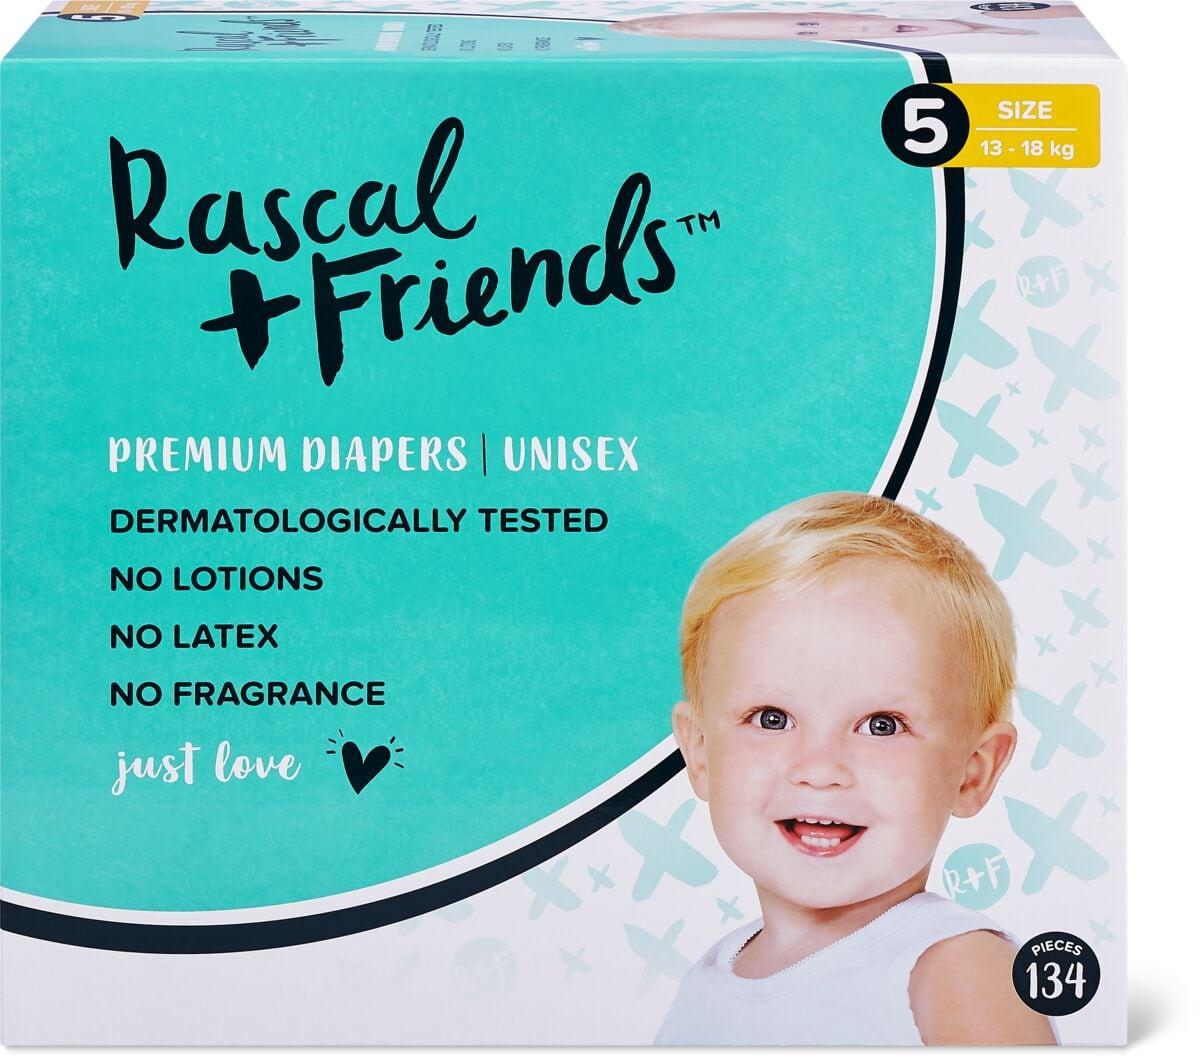 Rascal+Friends 5 Walker Monthly Box